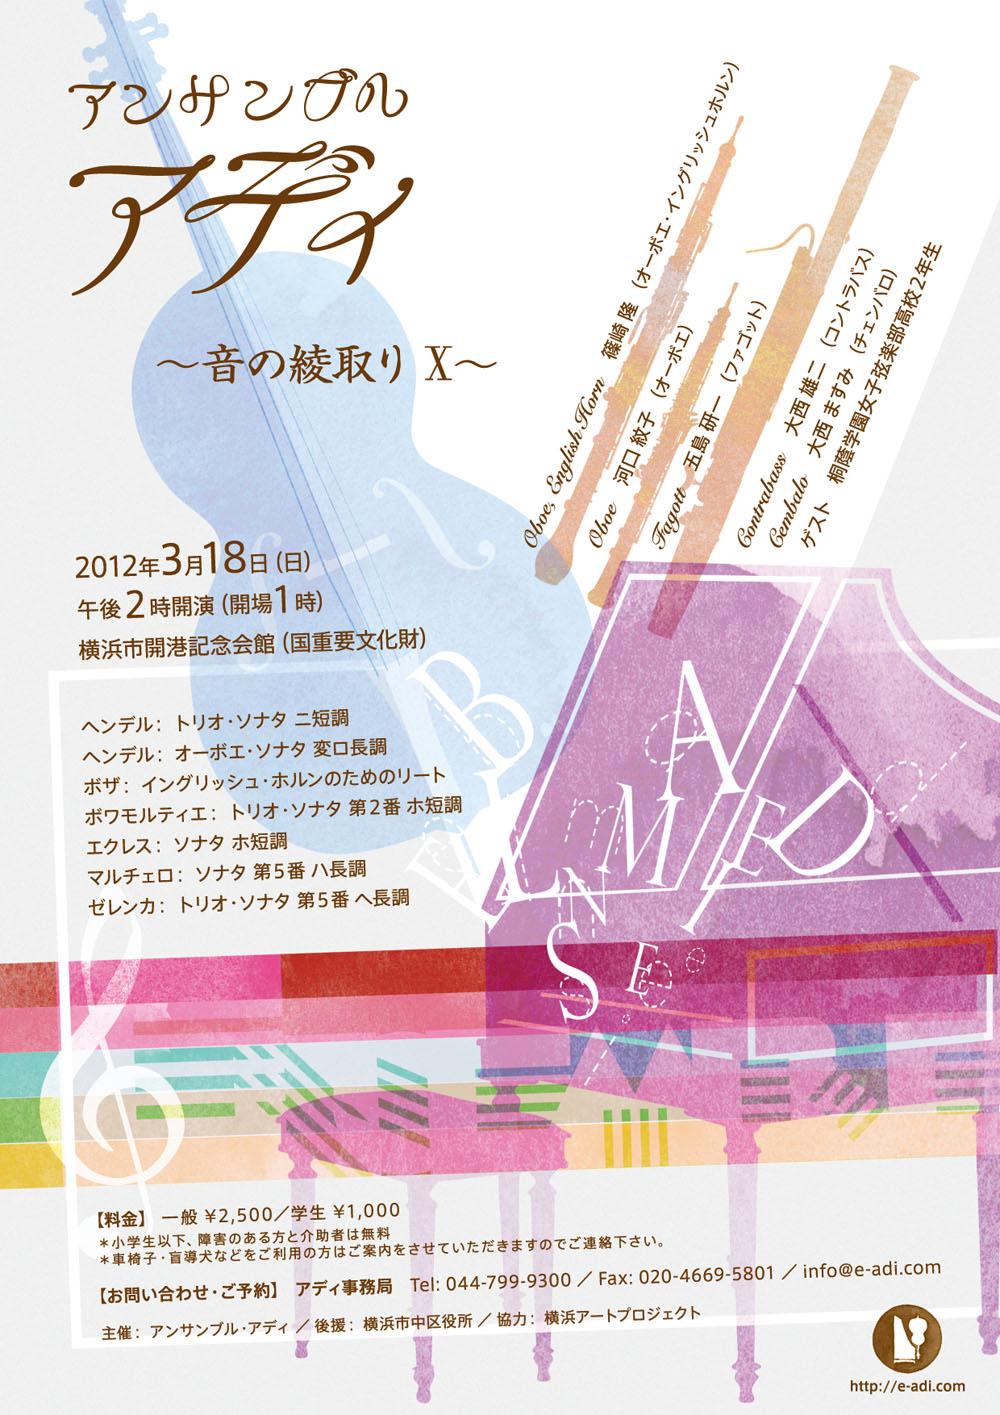 http://www.yokohama-artproject.com/images/20120318a.jpg